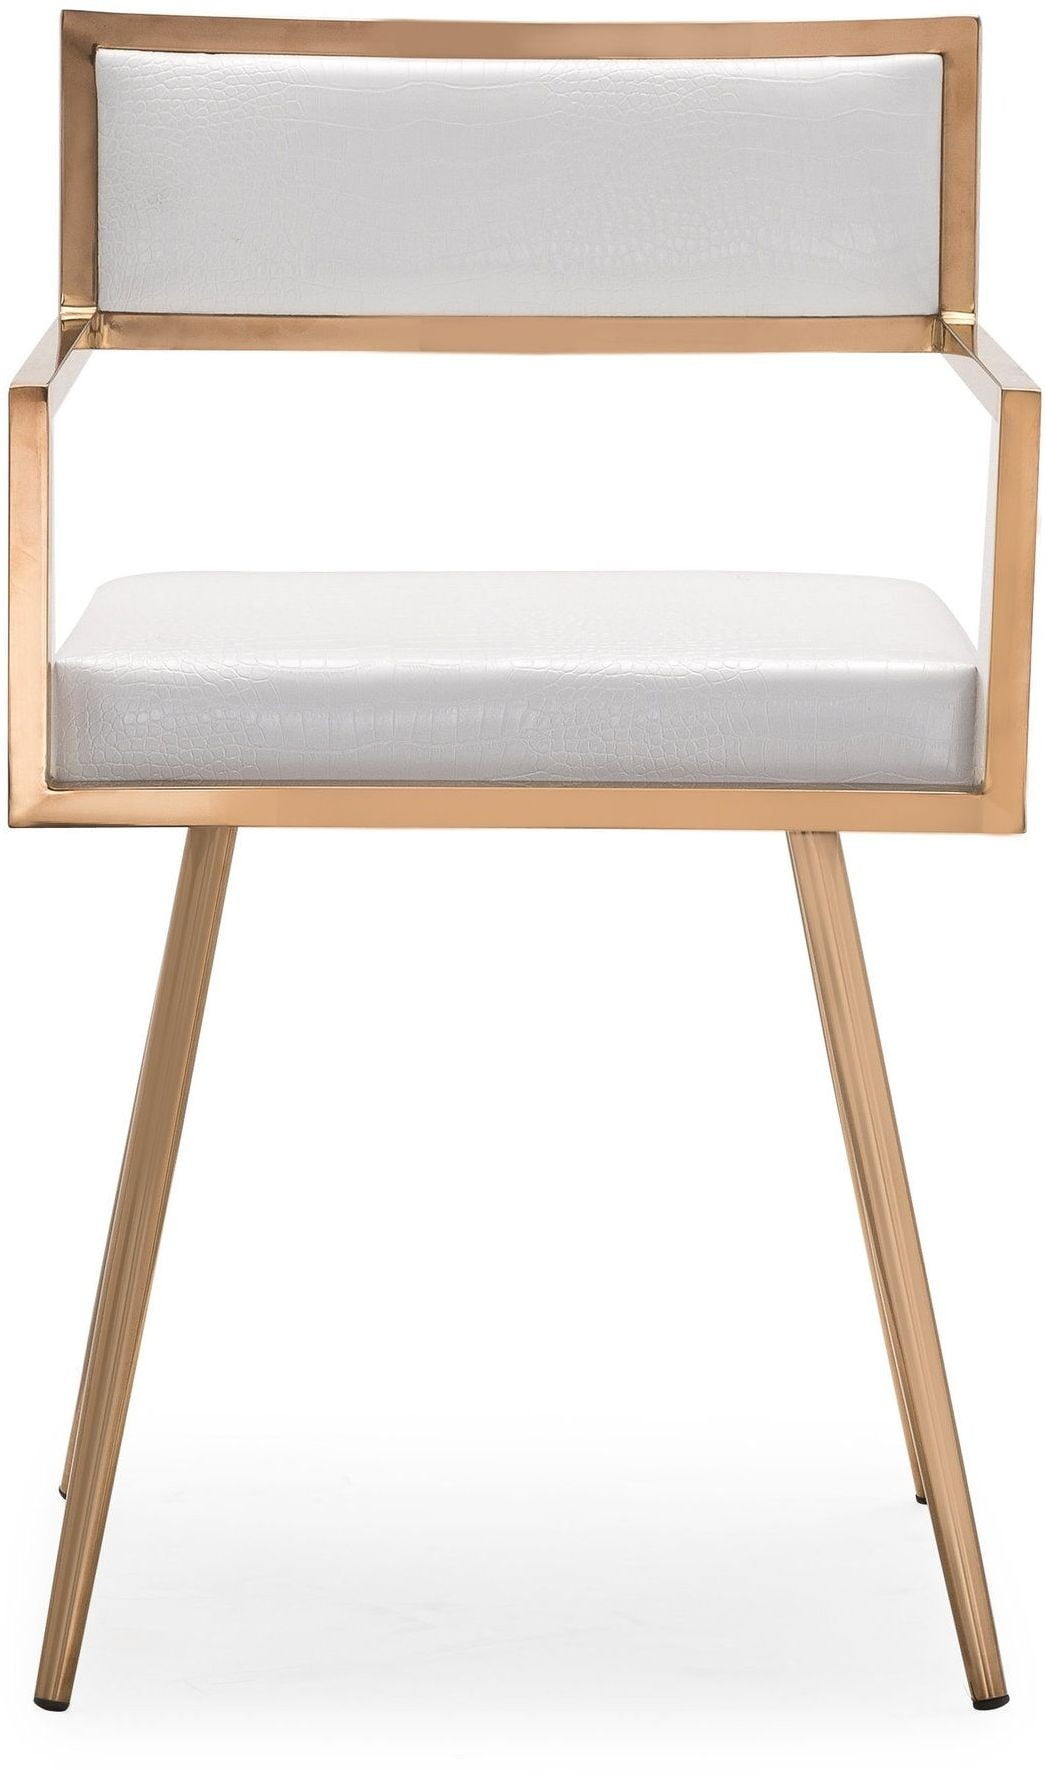 Marquee White Croc Arm Chair Set Of 2 G5460 Tov Furniture